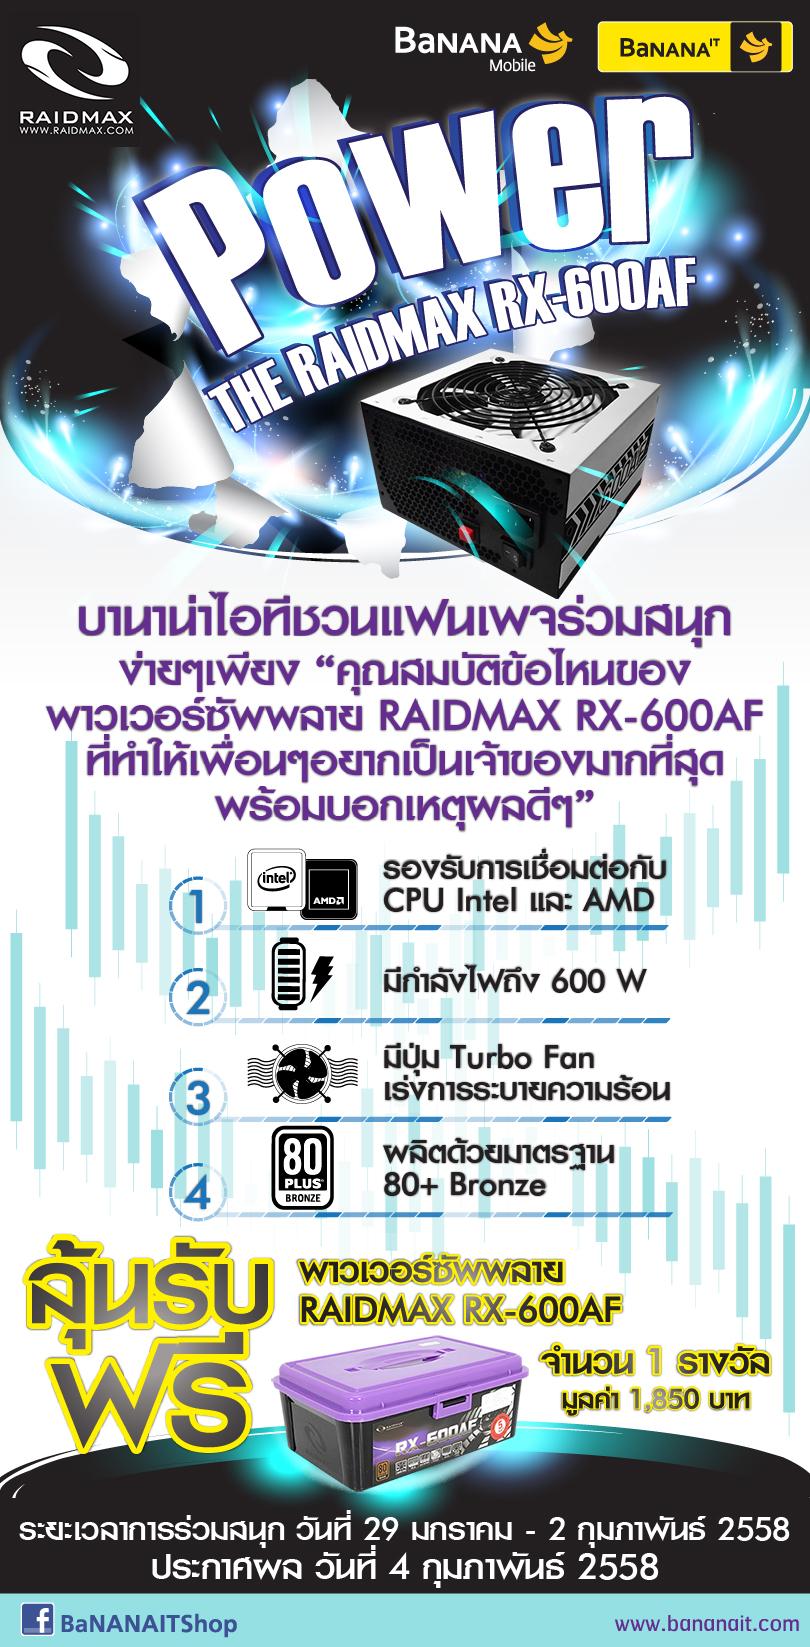 Power The RAIDMAX RX-600AF_800 x_800 x